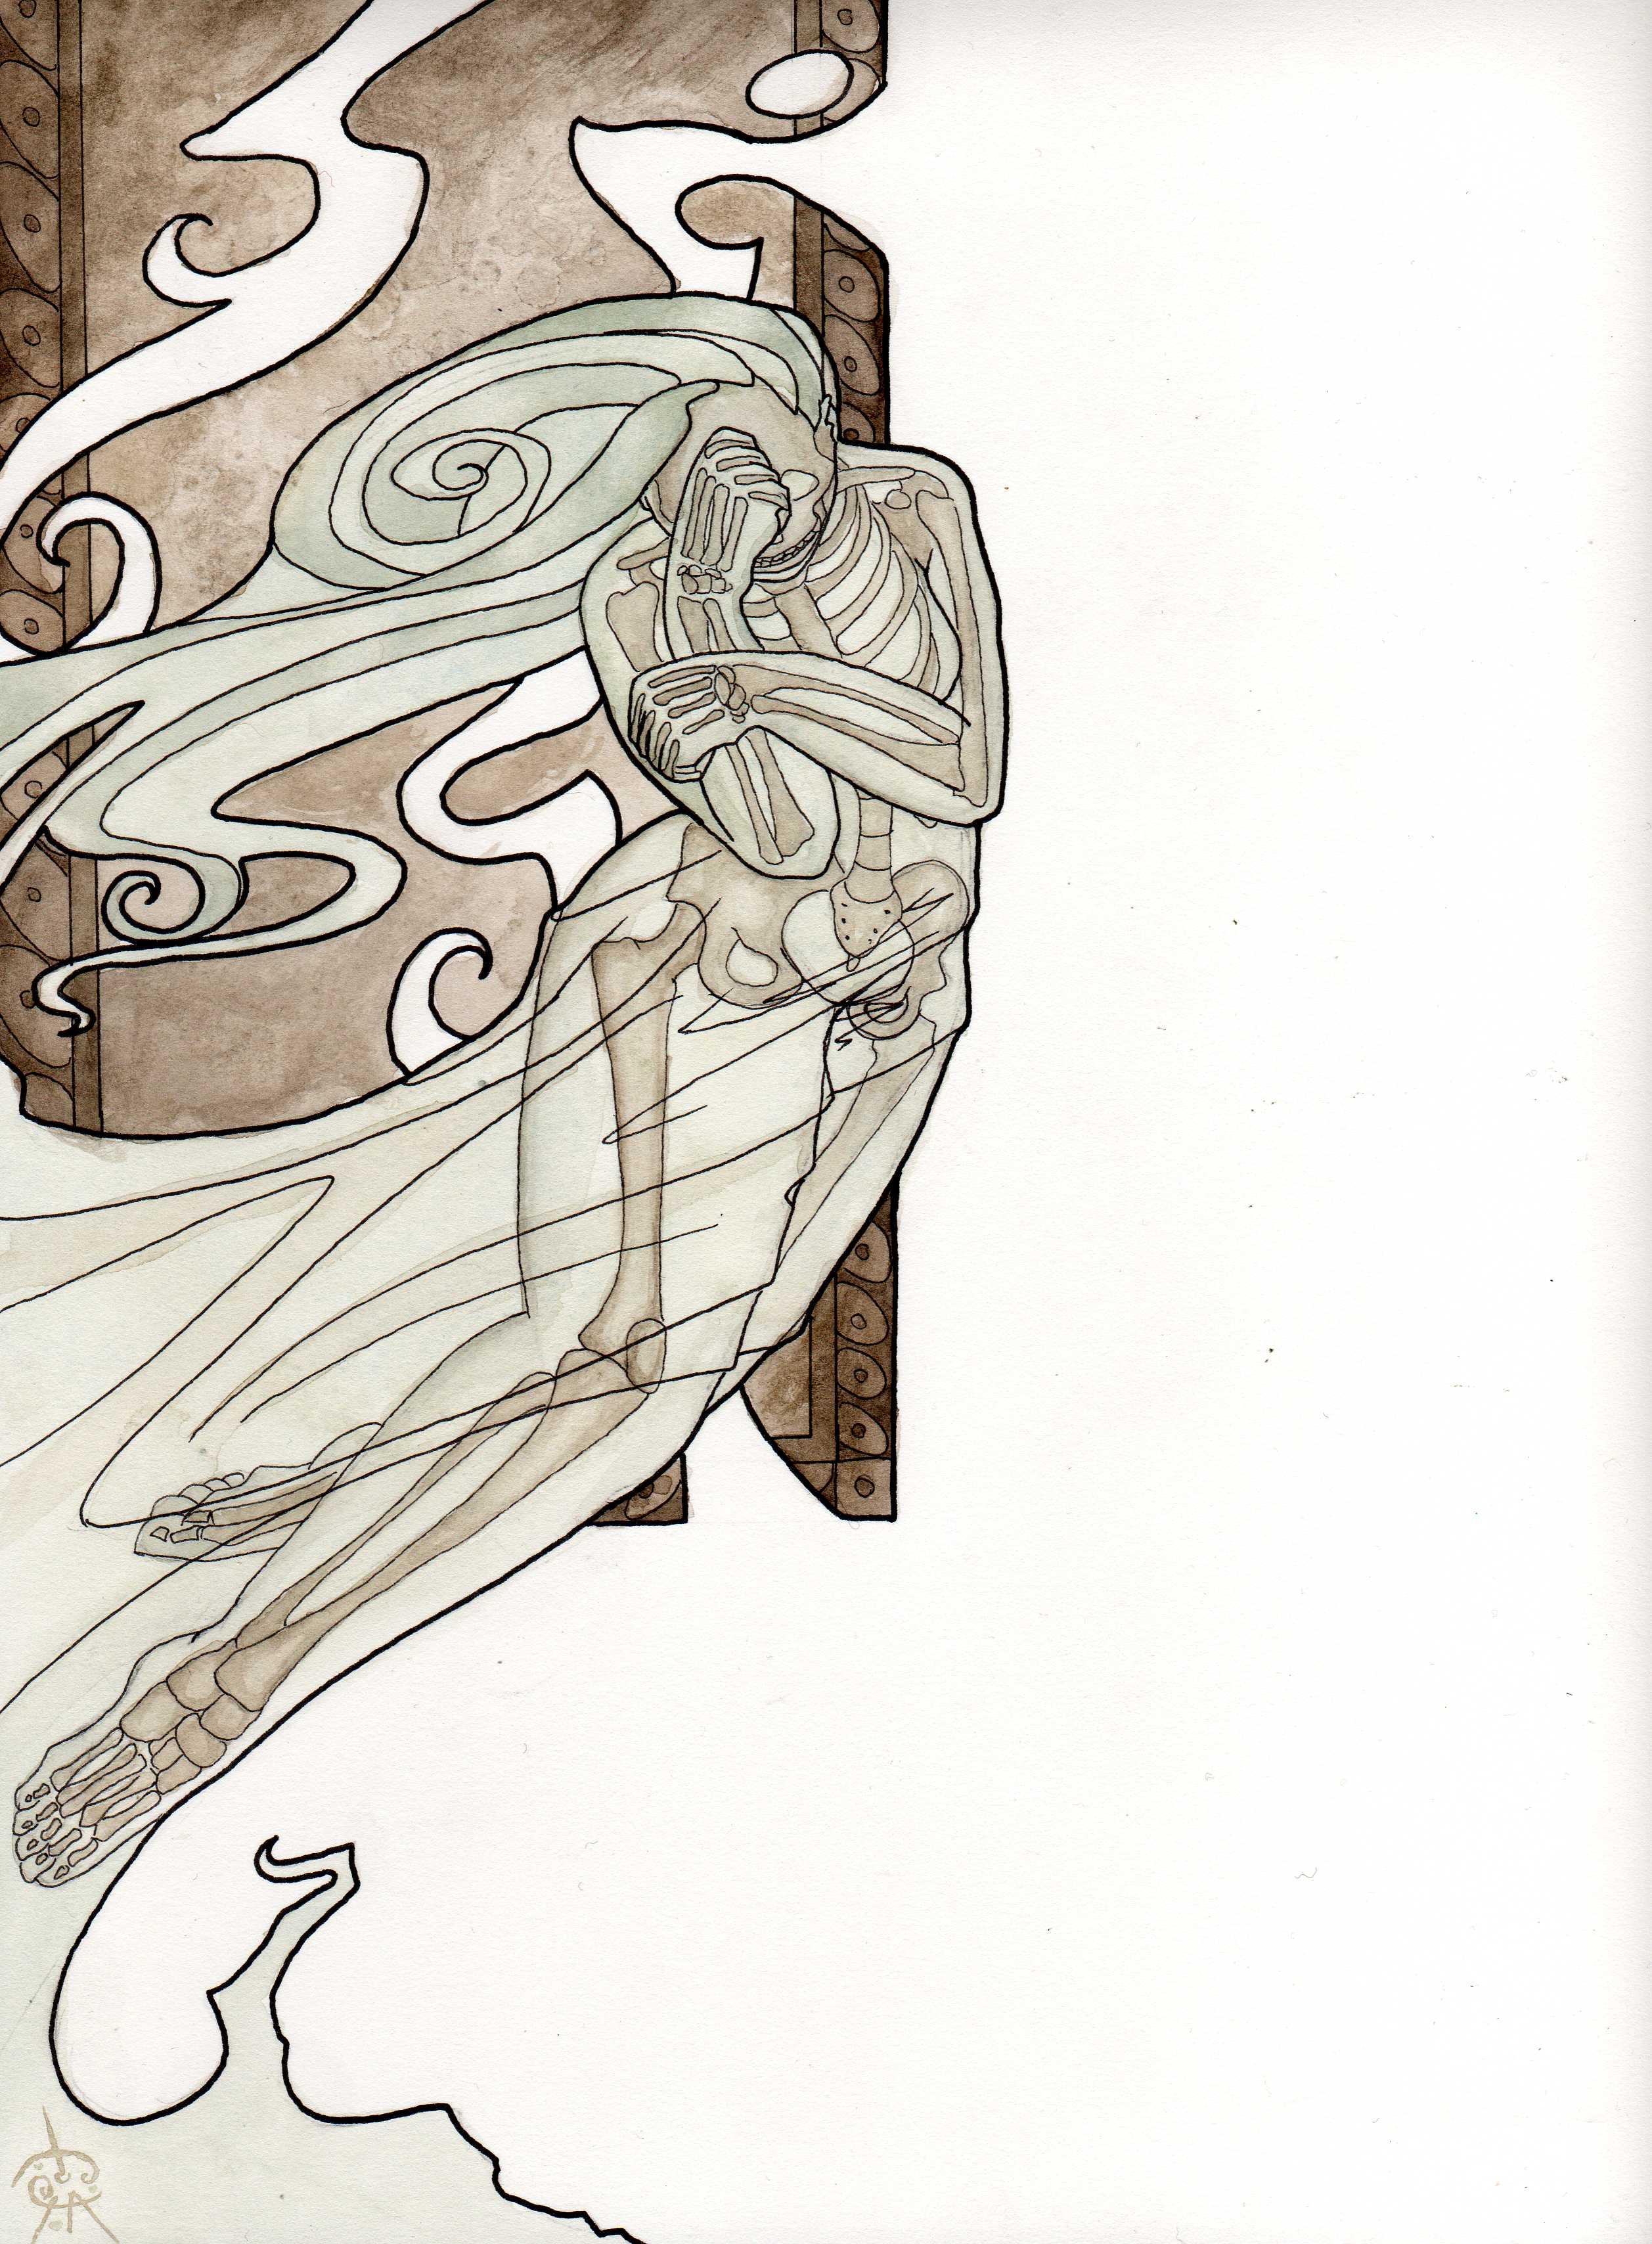 Tin Man by Anastasia Inspiderwiht. Image Courtesy the Artist